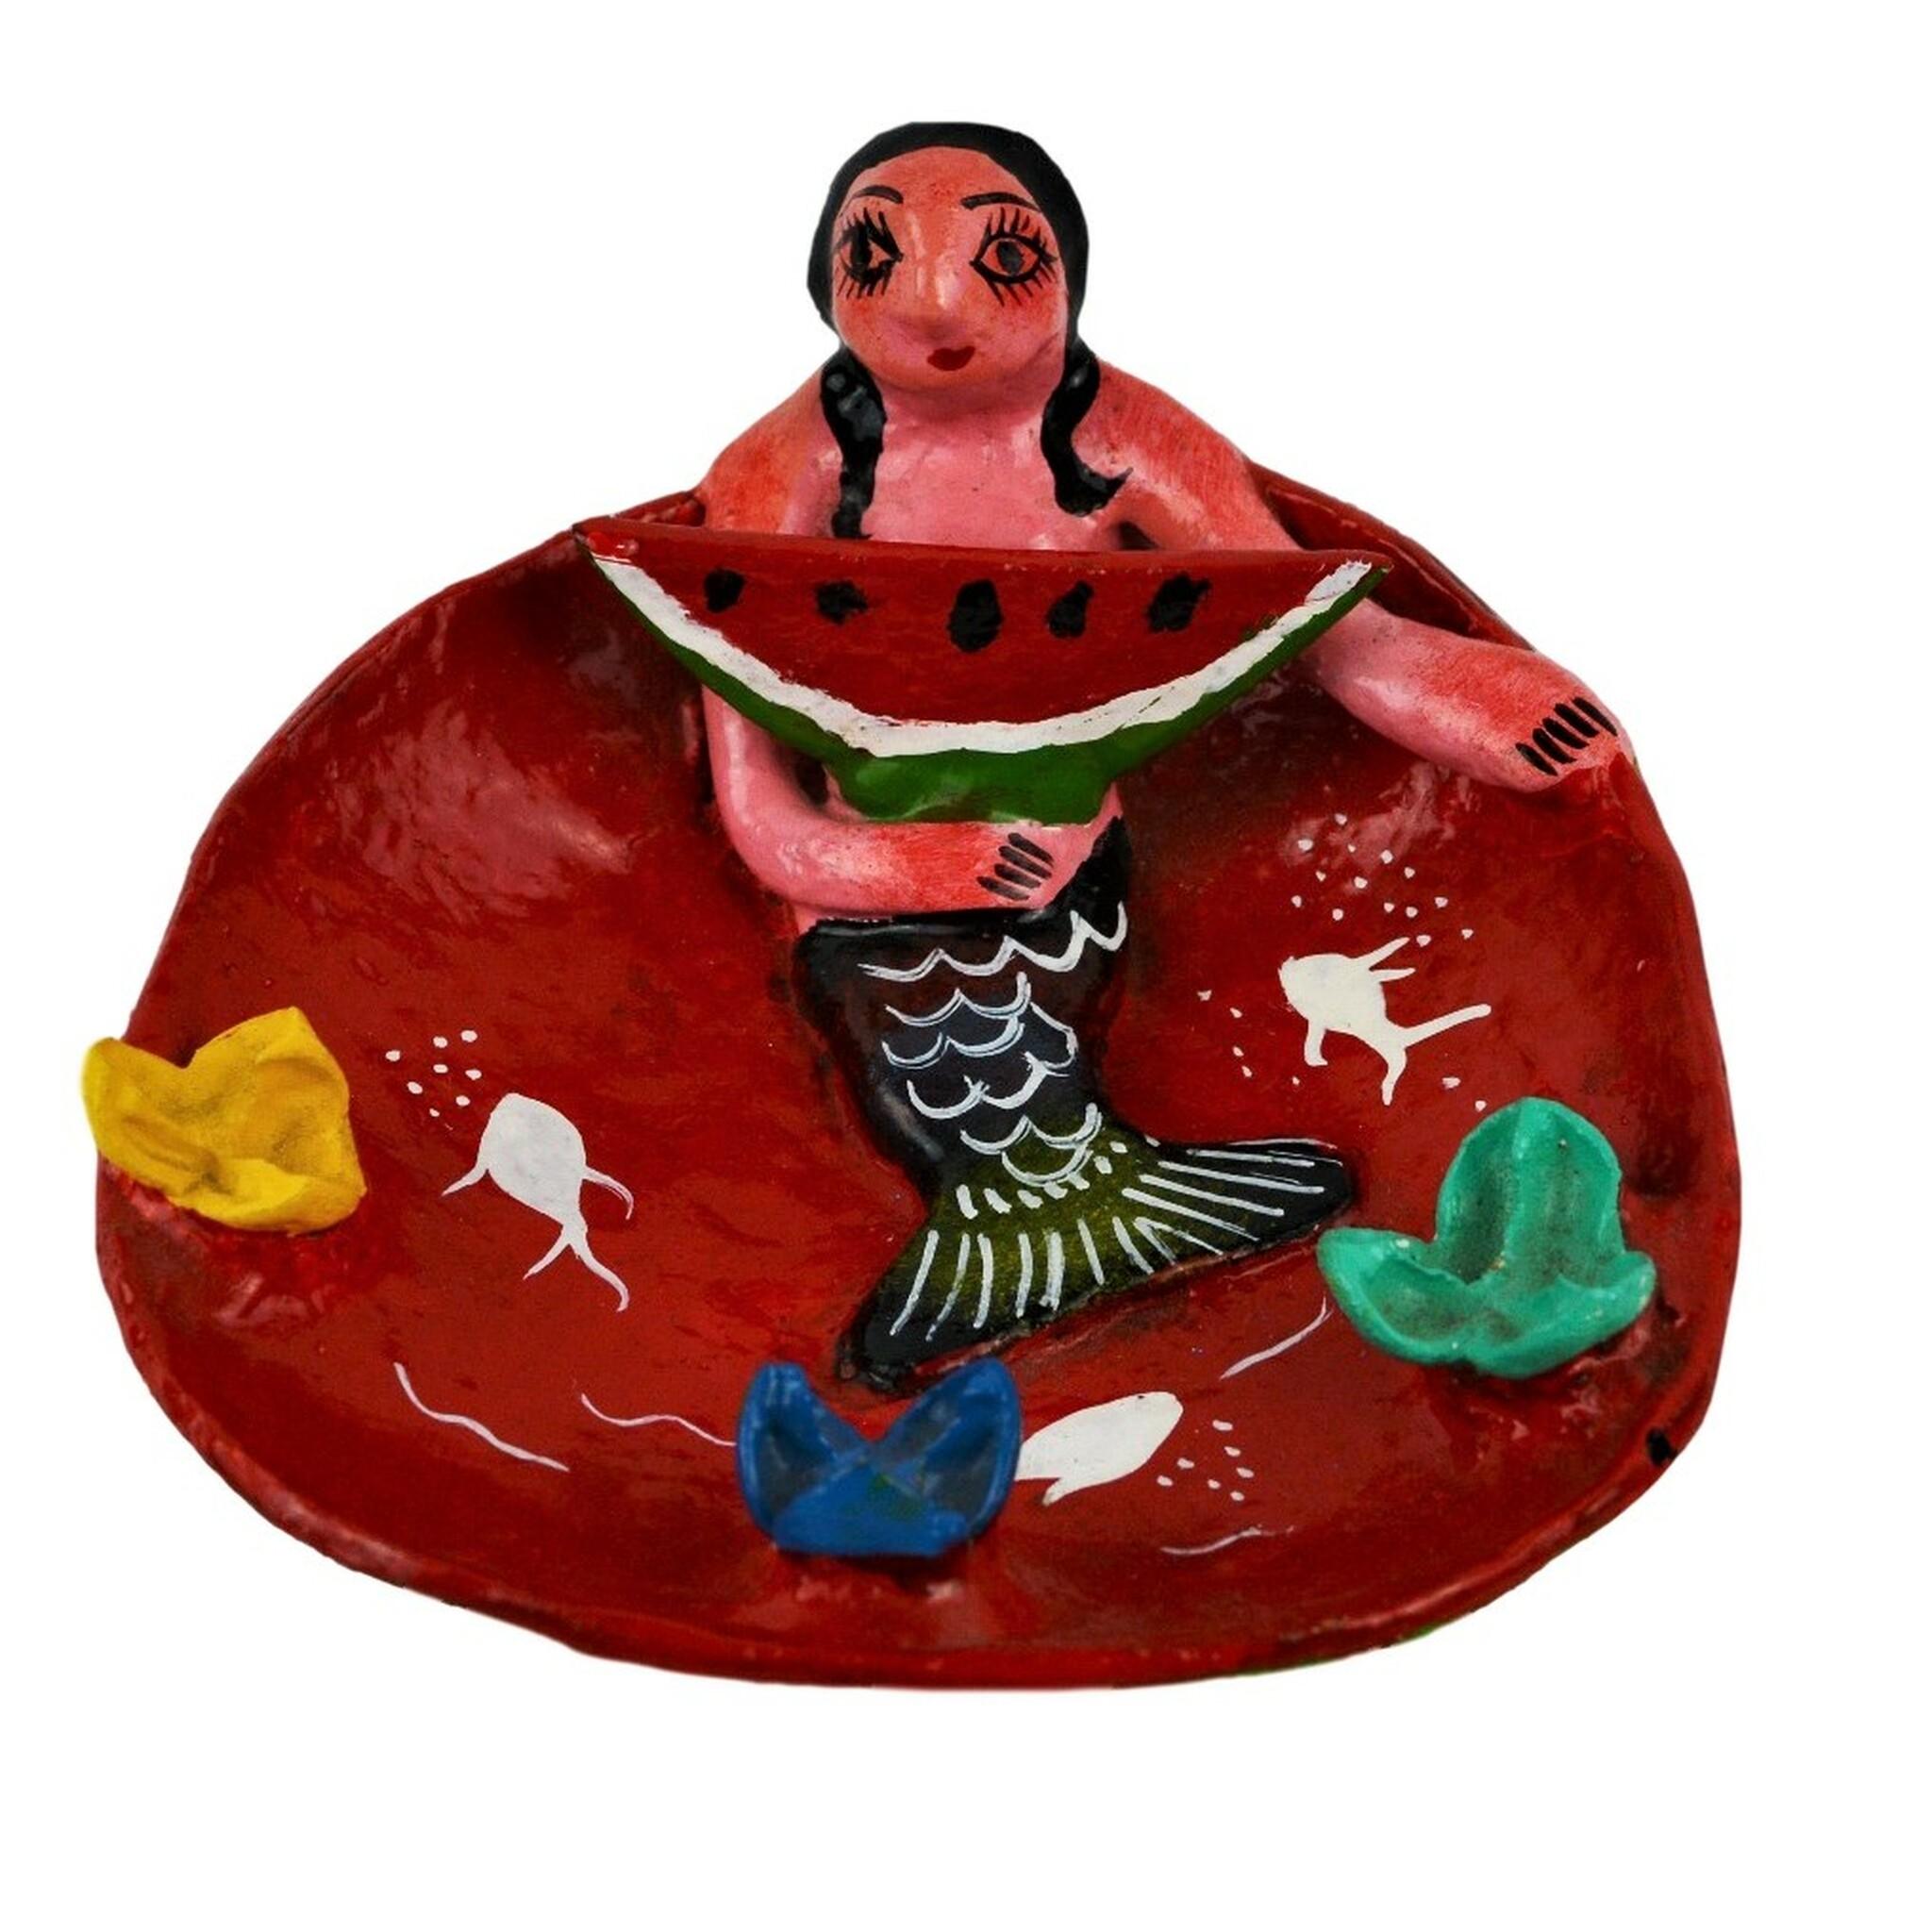 Mermaid Coconut Doll